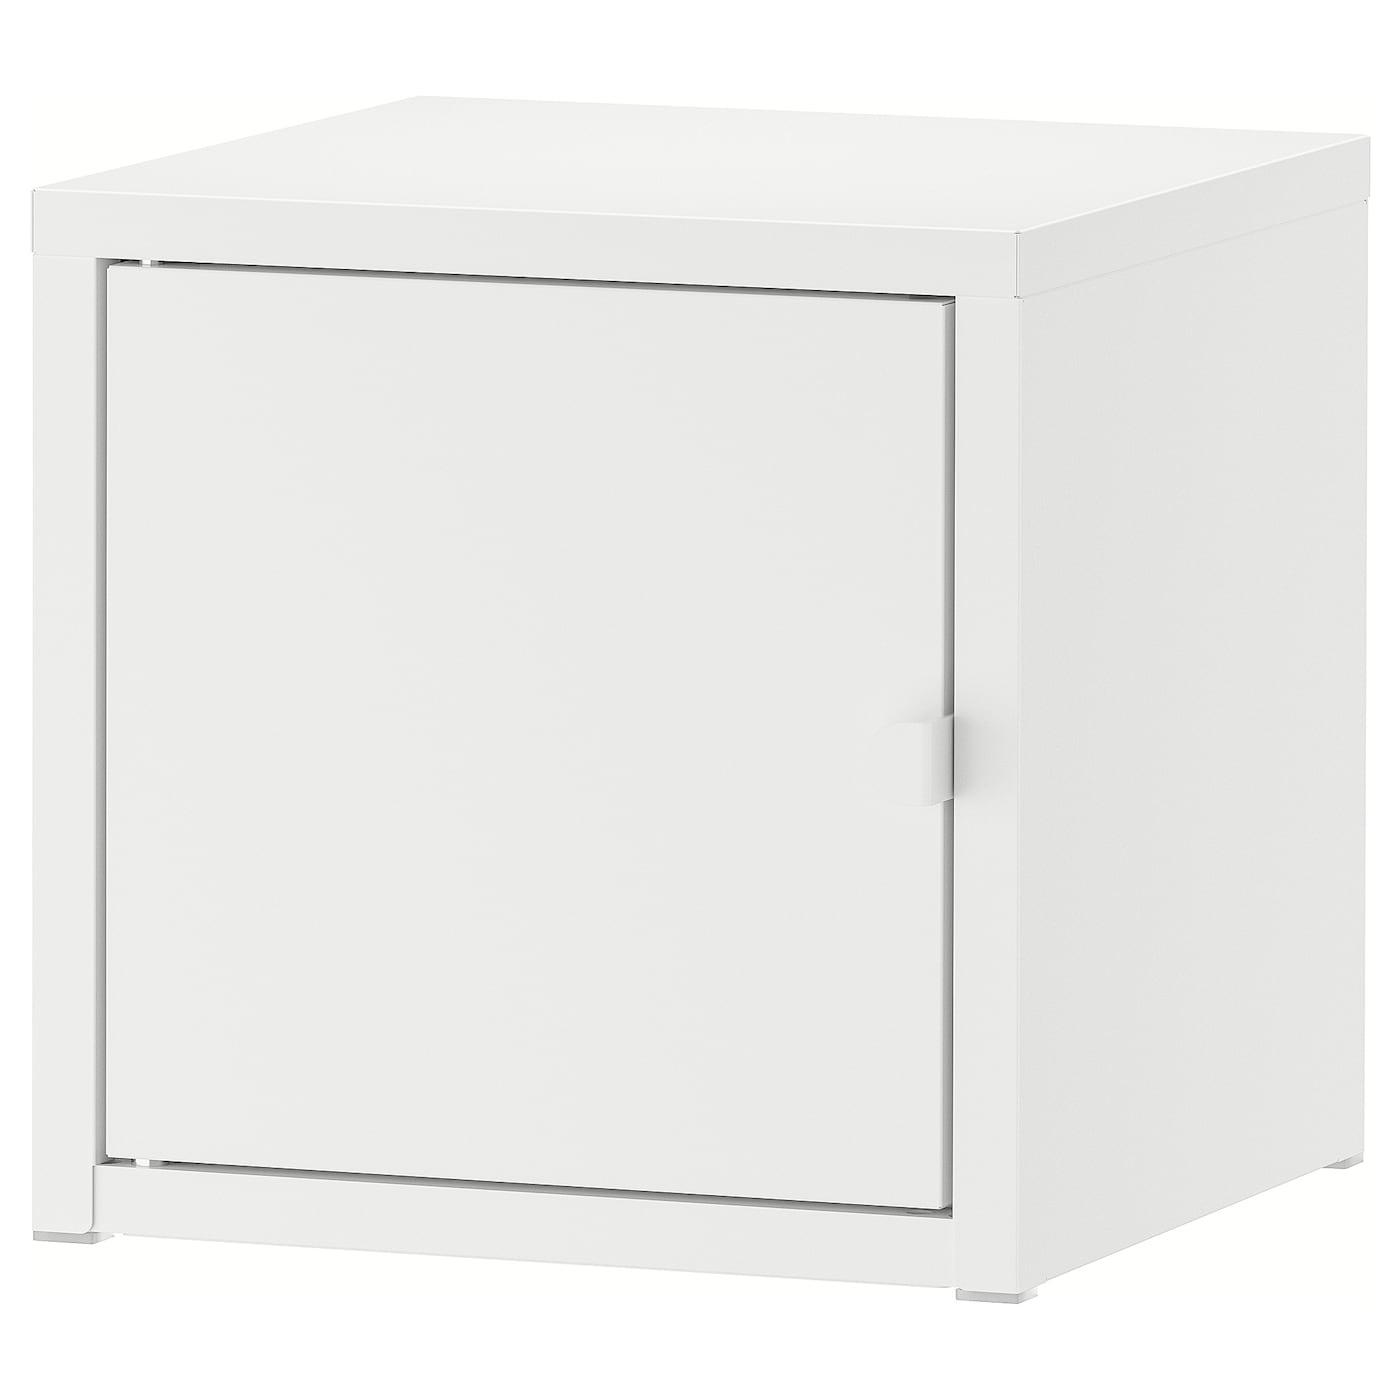 Ikea Metall Kommode 2021